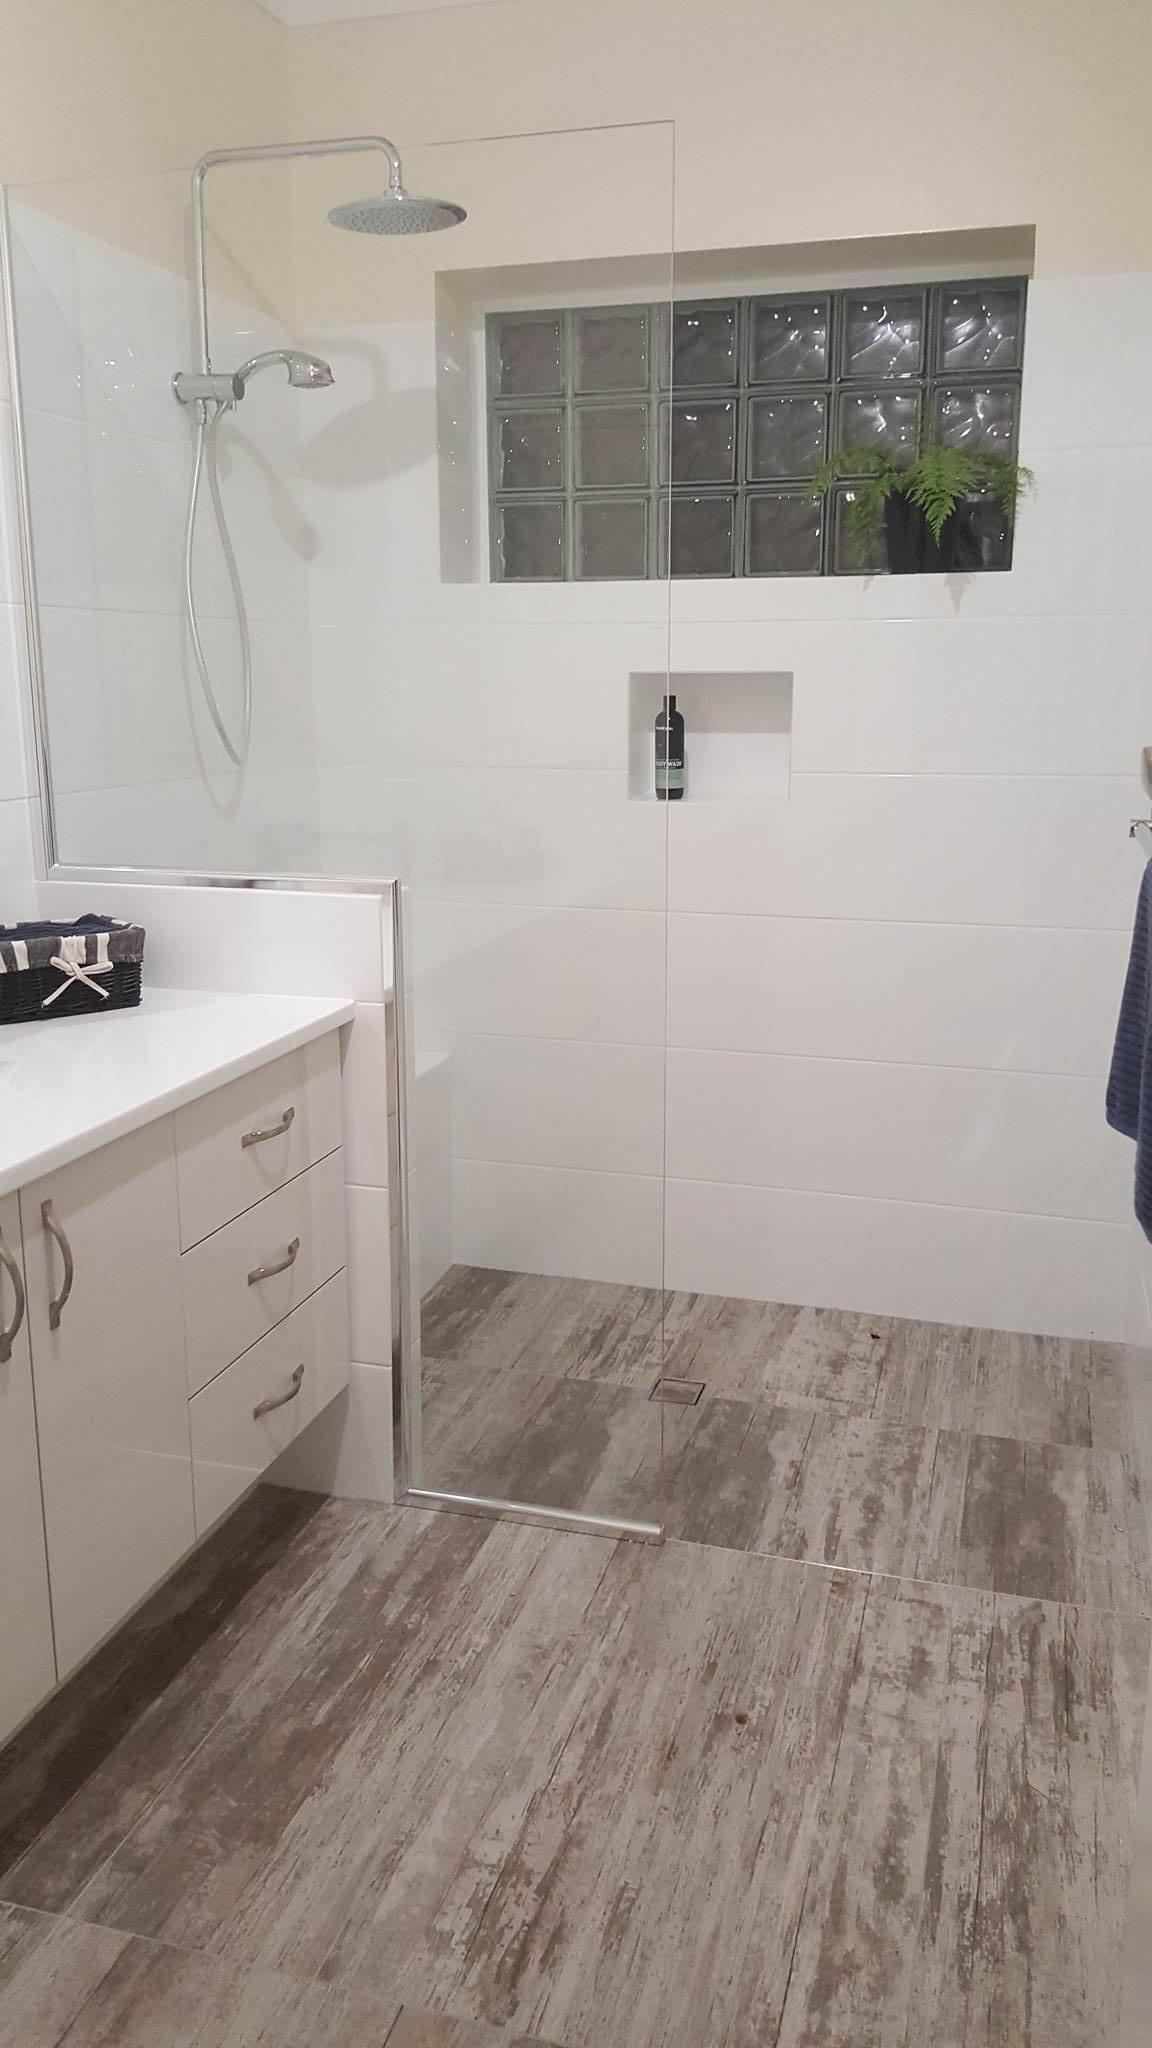 Bathroom Decor & Tiles - Bathroom Accessories & Equipment - 93 ...